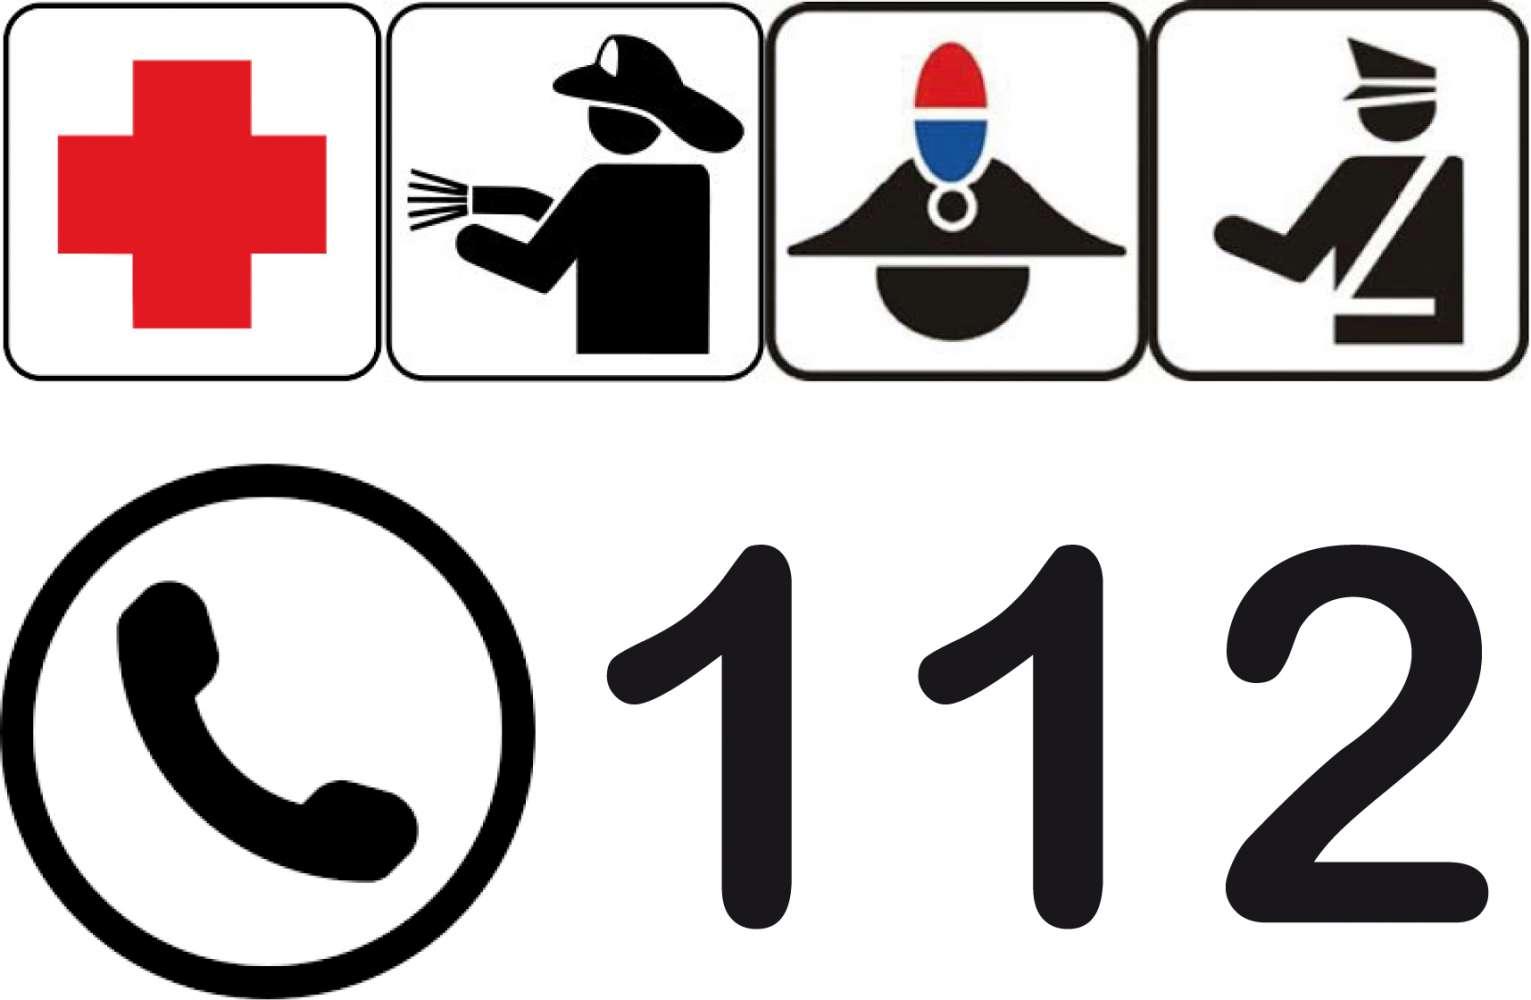 Dai 17 d'otober inant vel ince te Südtirol le numer unitar 112.